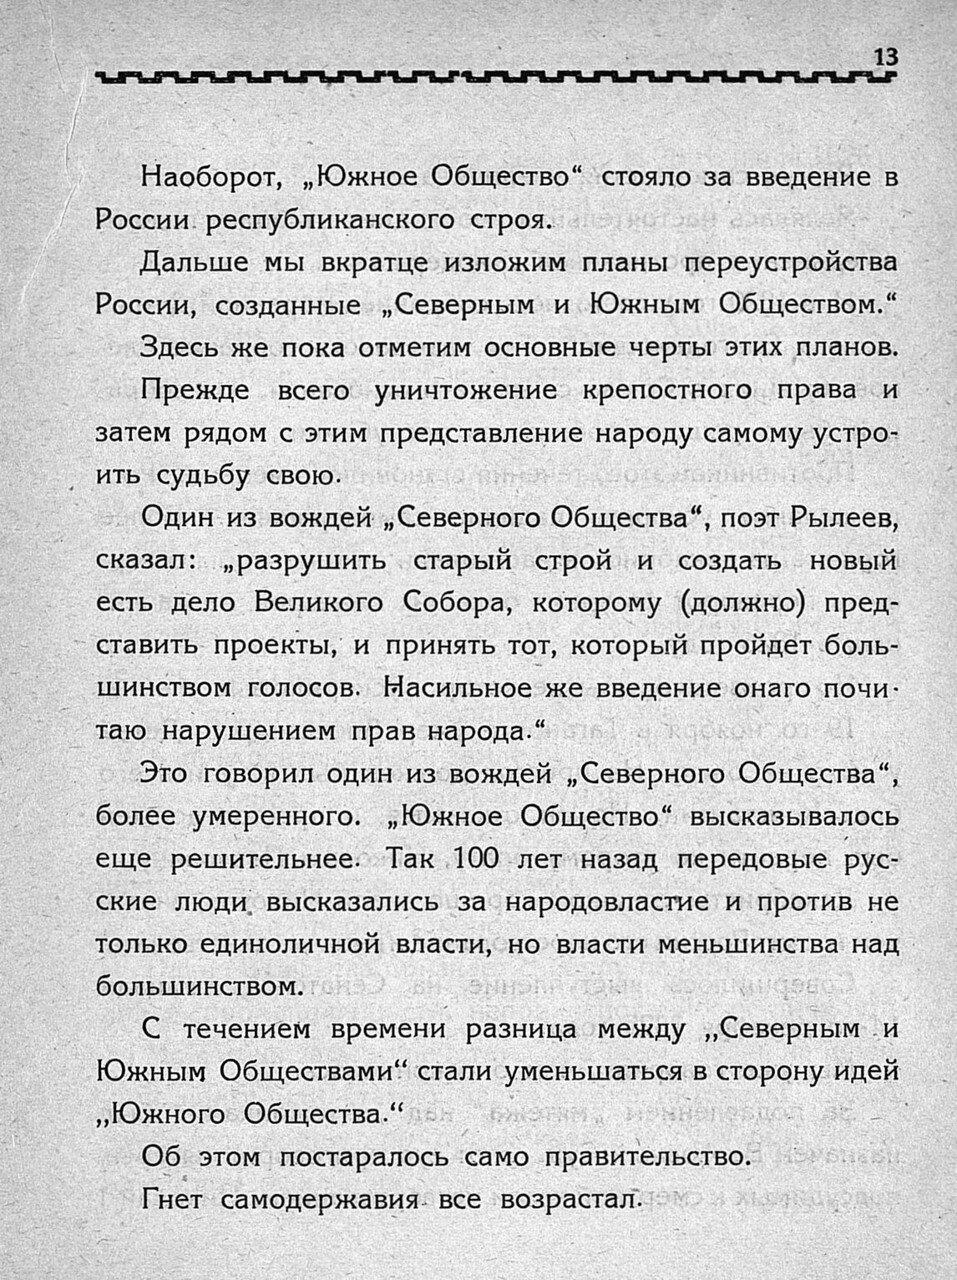 https://img-fotki.yandex.ru/get/96770/199368979.23/0_1bfad1_d1961666_XXXL.jpg